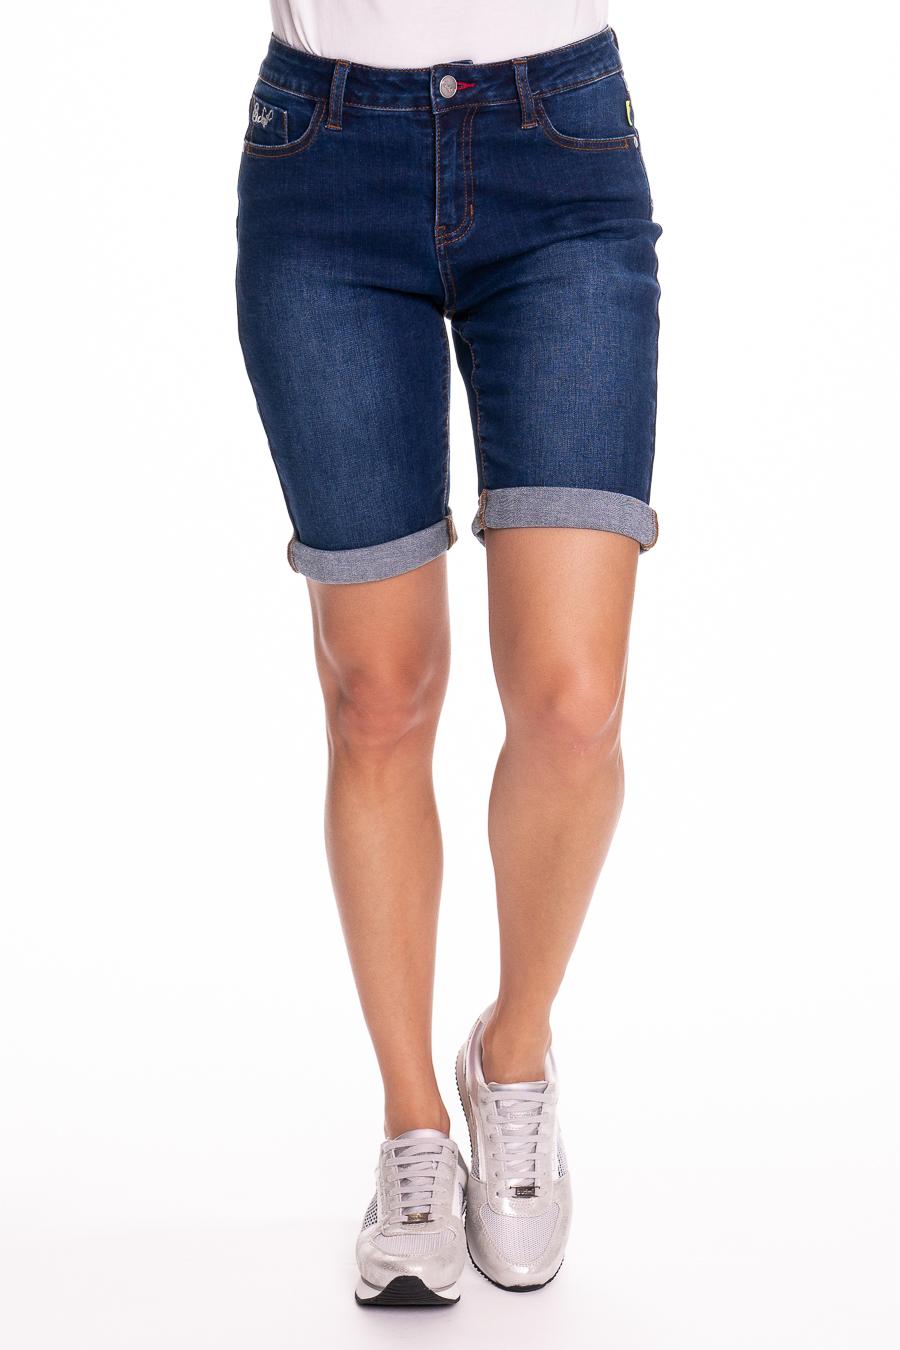 Női rövidnadrág | budmil